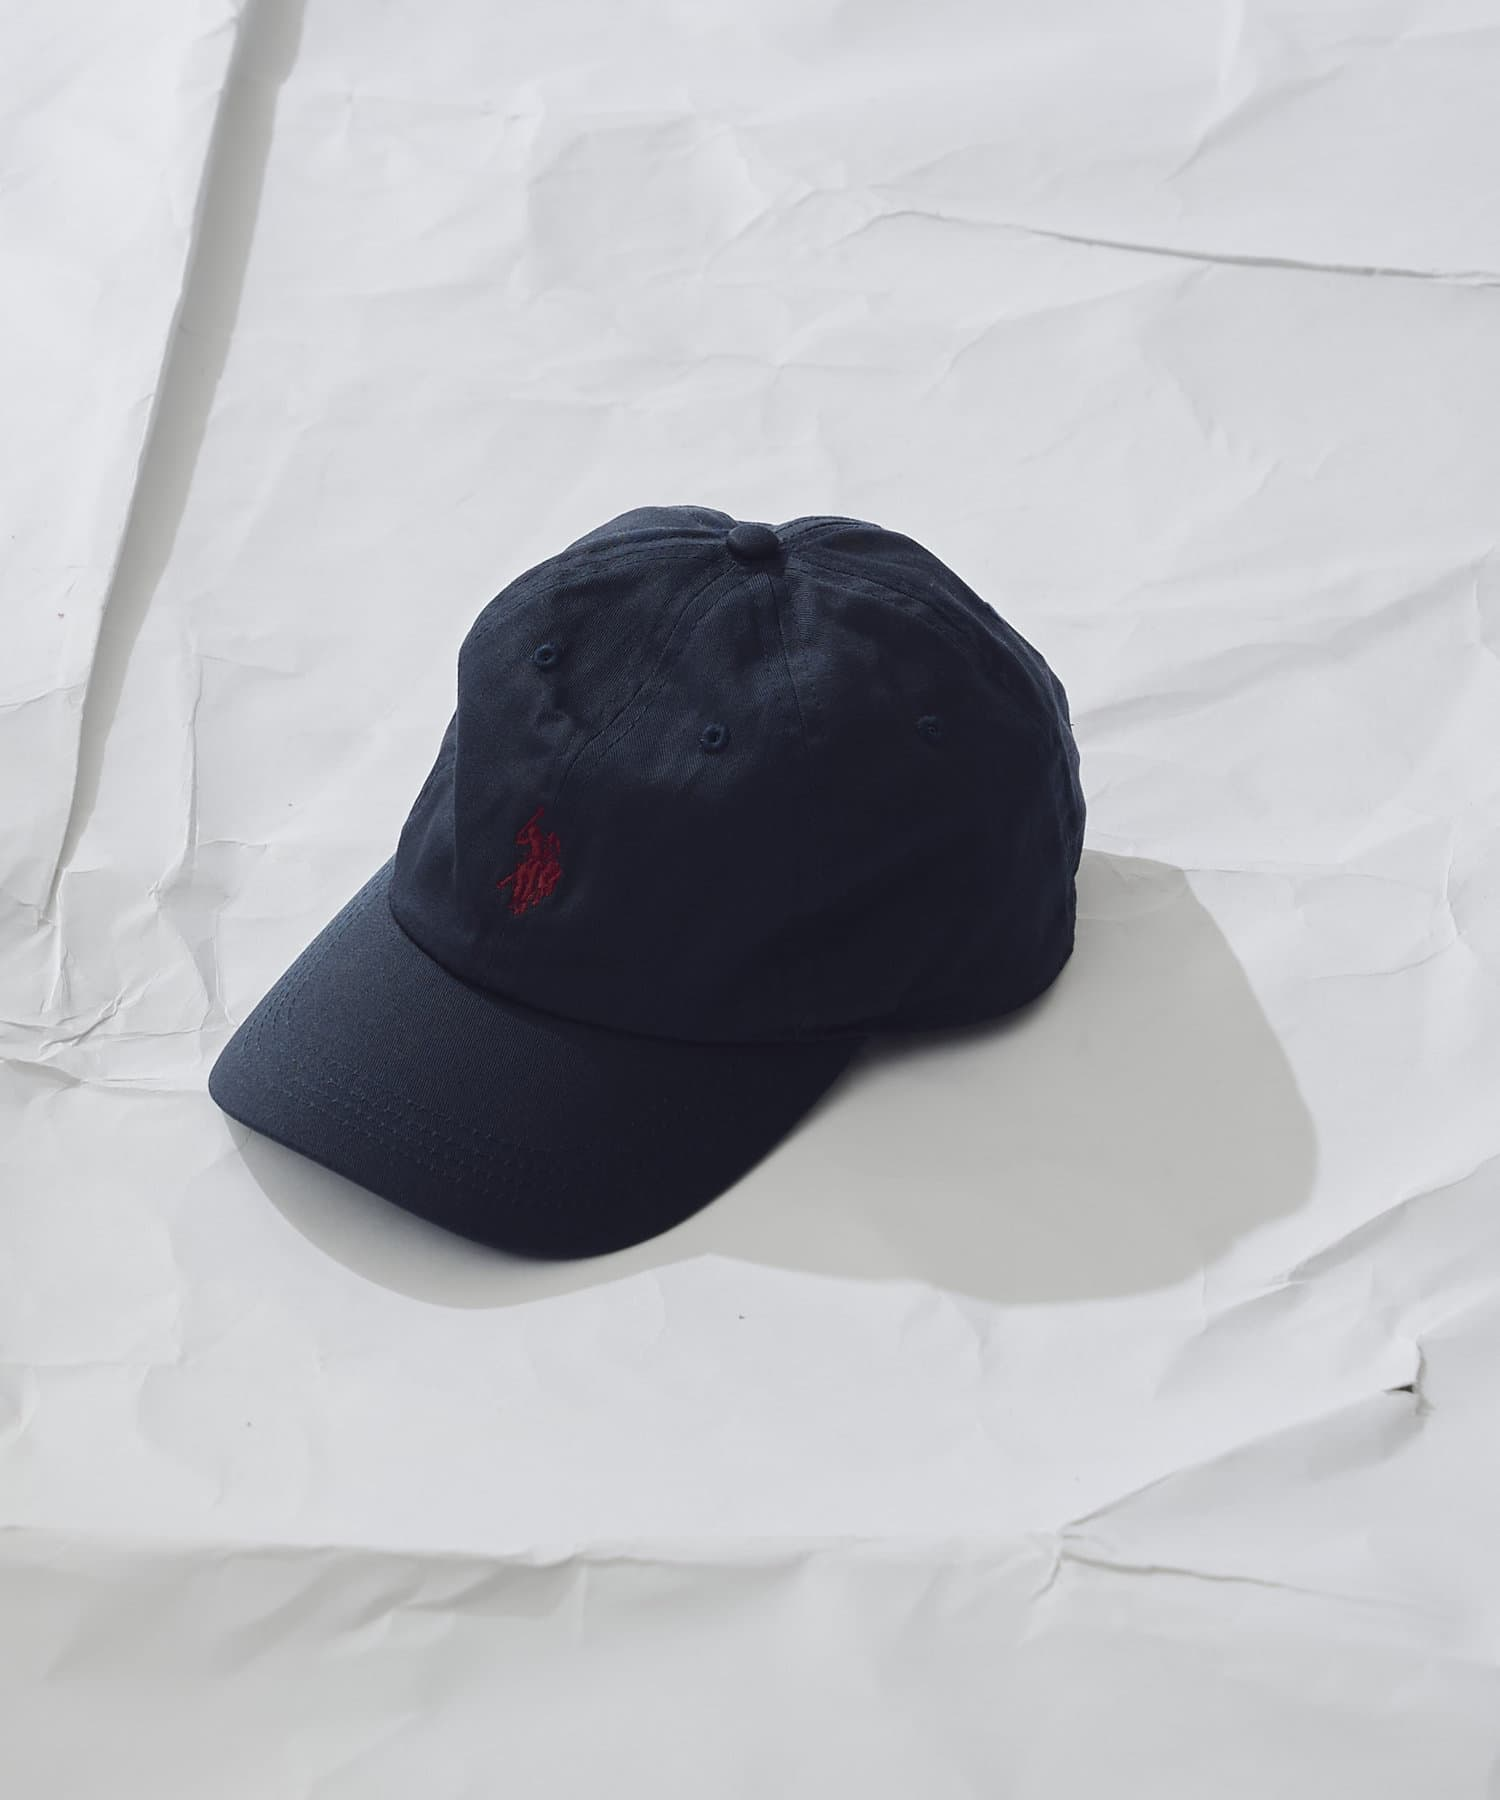 CPCM(シーピーシーエム) 新色追加【U.S. POLO ASSN. /ユーエスポロアッスン】刺繍キャップ